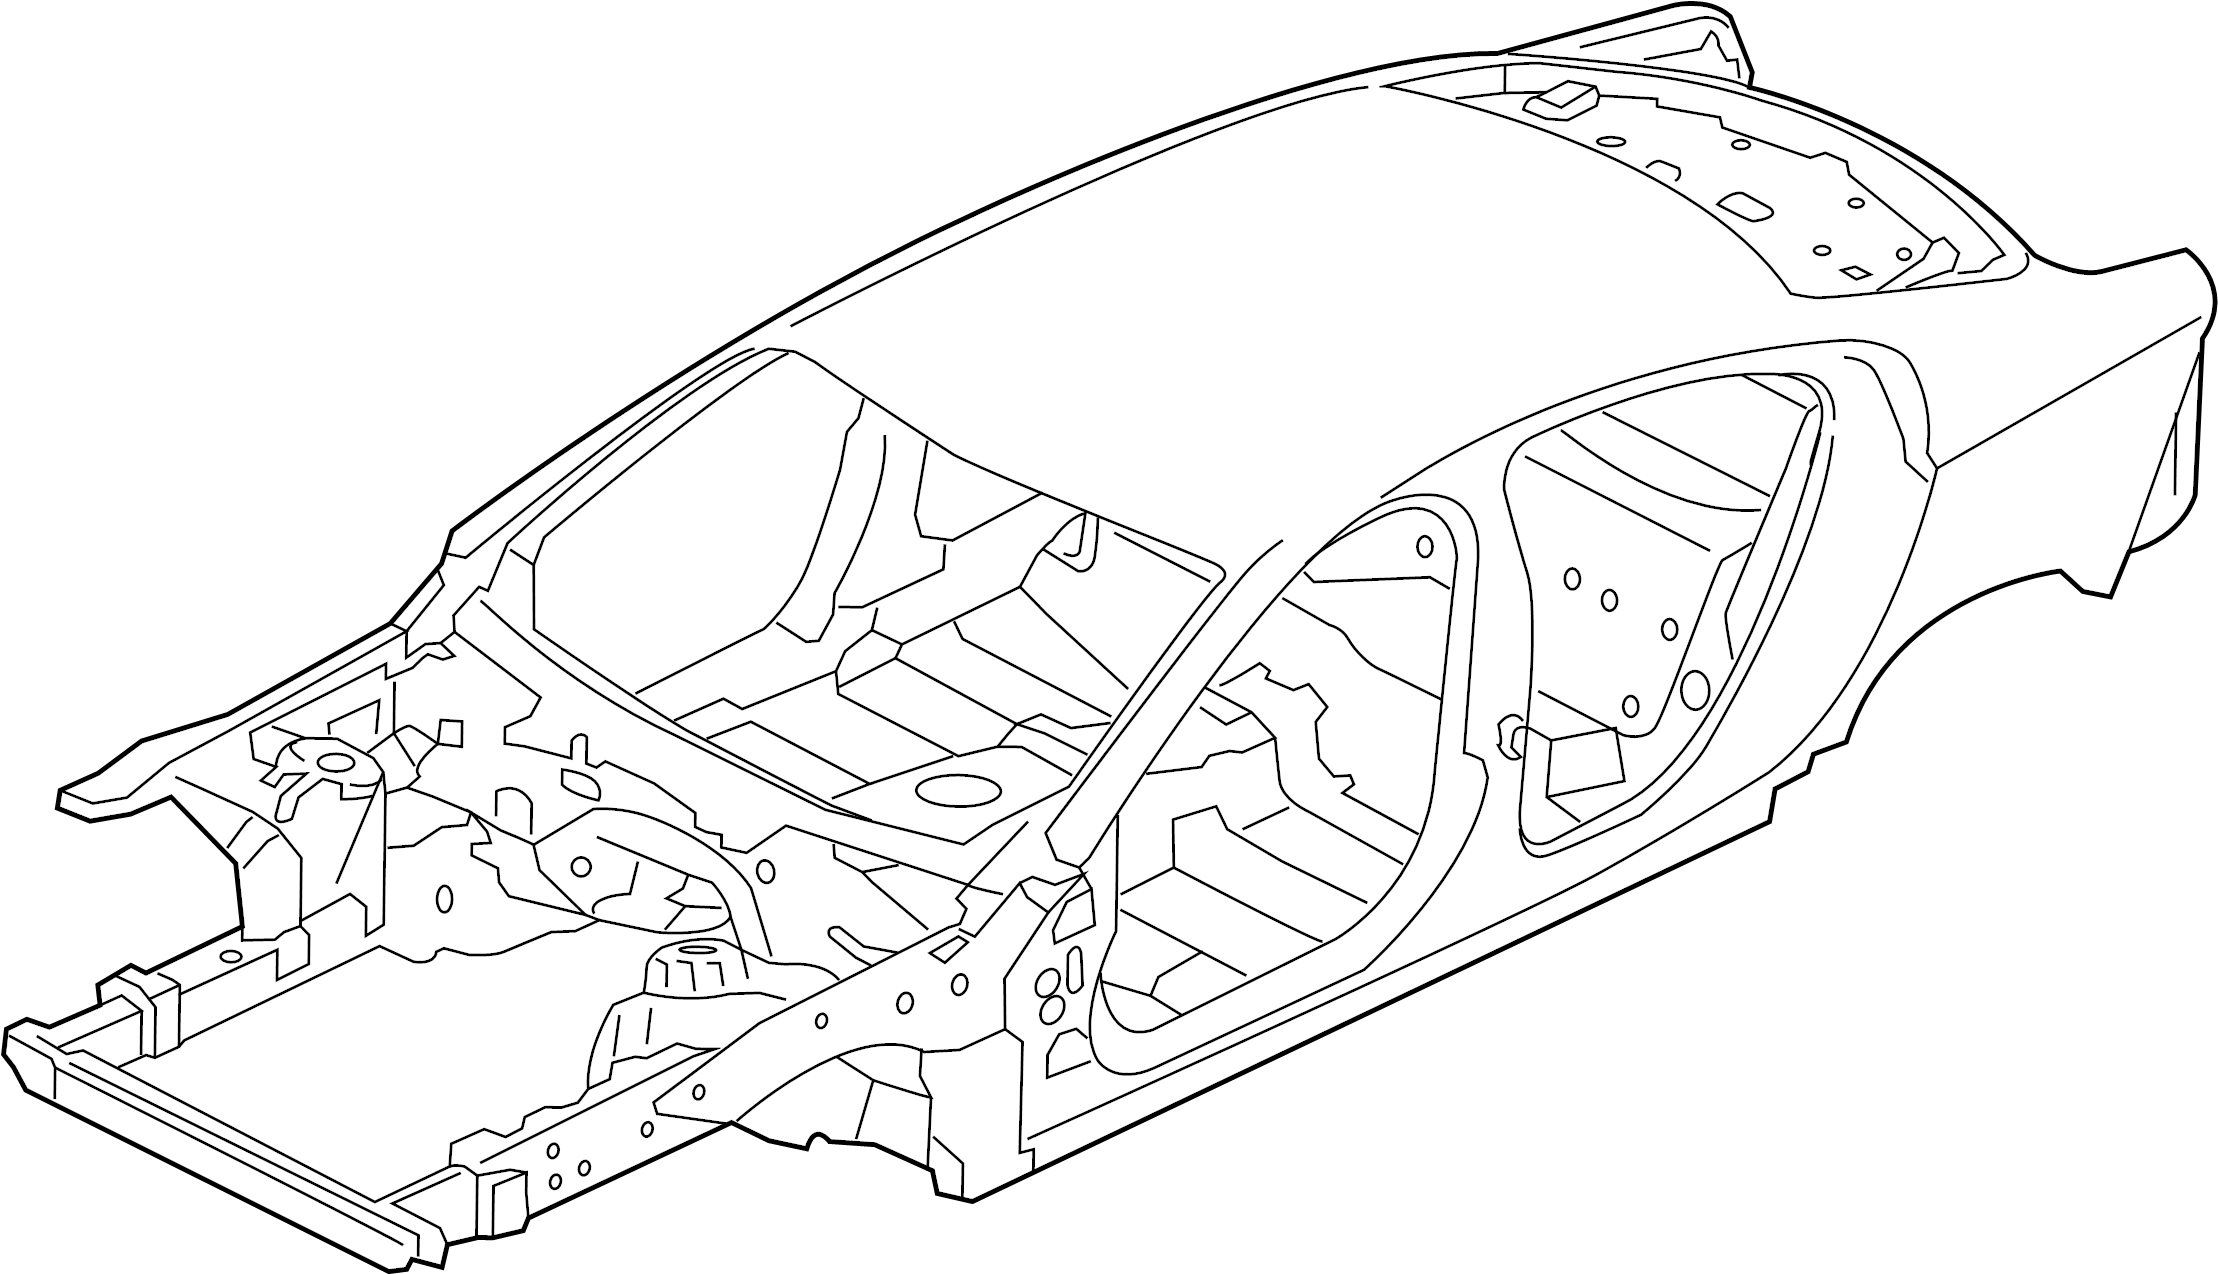 Jaguar Xe Body Assembly Bodyshell Vehicle Body Shell W O Awd From Vin W O